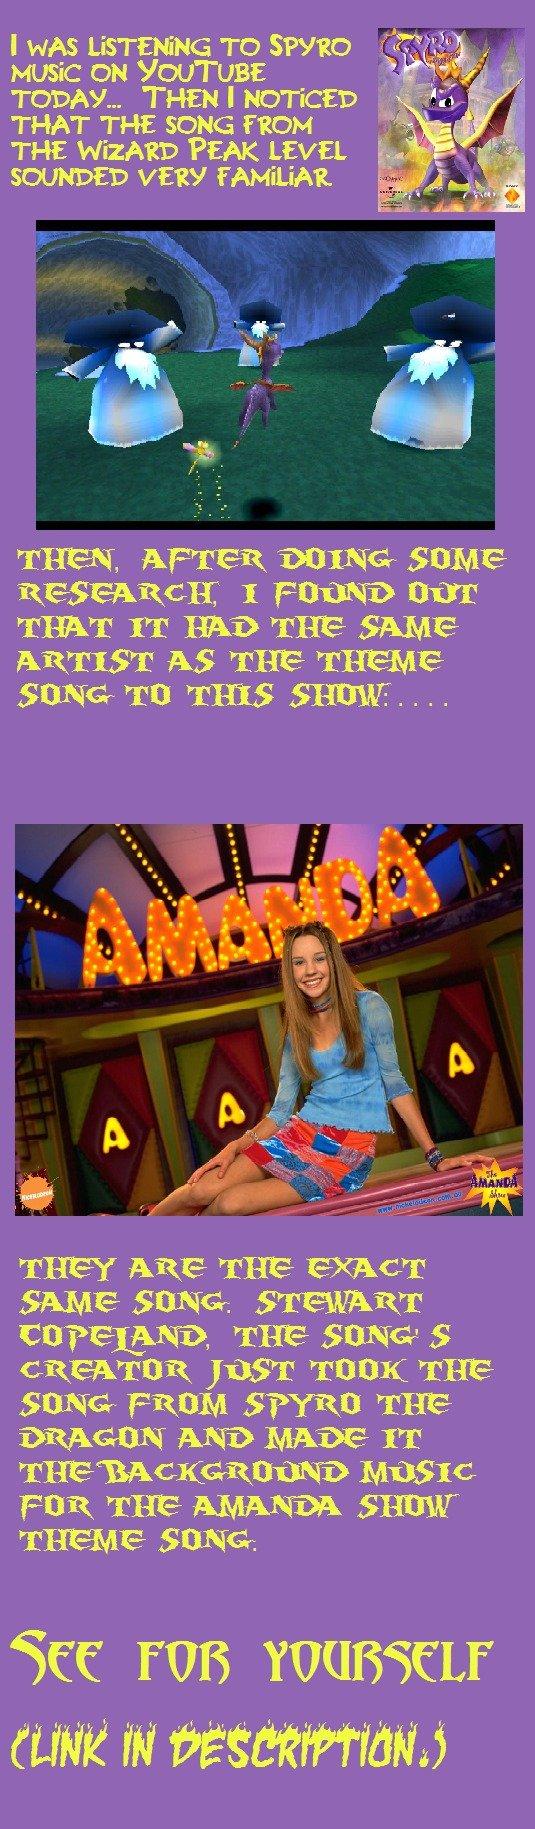 My Mind Was Blown. Amanda Theme: www.youtube.com/watch?v=K-sc1hlHR-A&feature=related Spyro: www.youtube.com/watch?v=-yQNs6SAXEE&feature=related. THAT TH